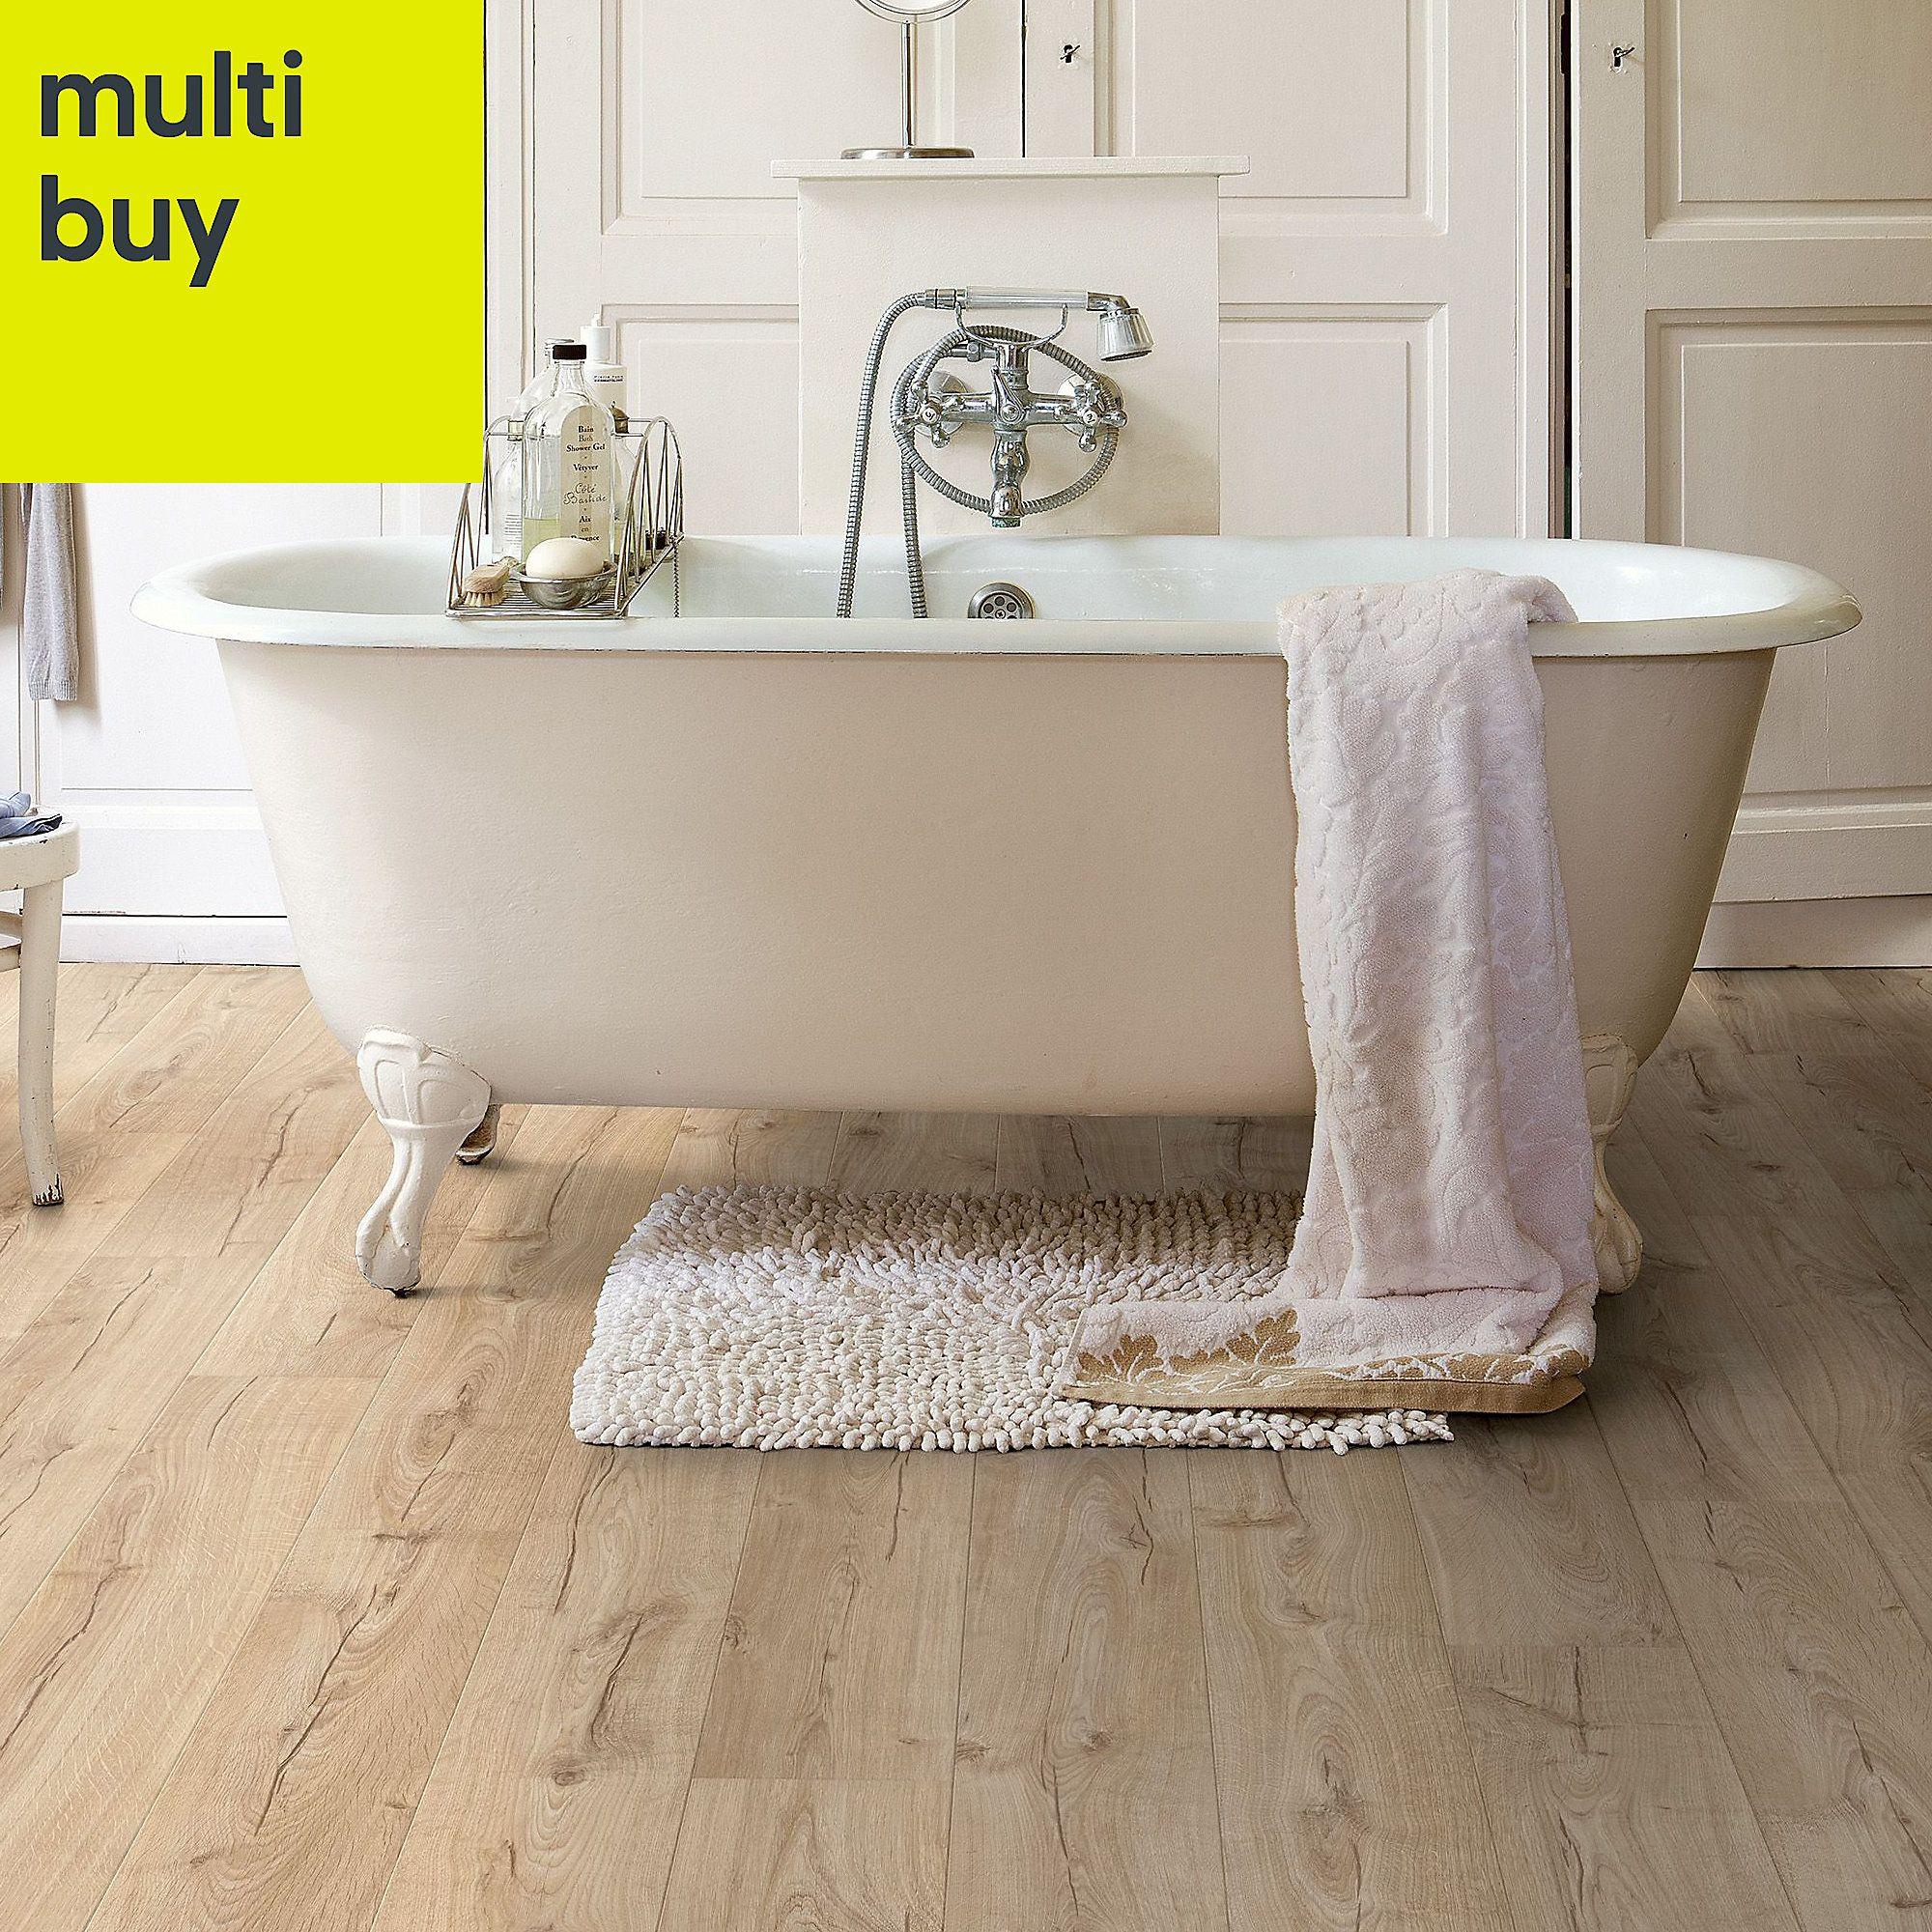 Quickstep Aquanto Natural Oak effect Laminate flooring, 1